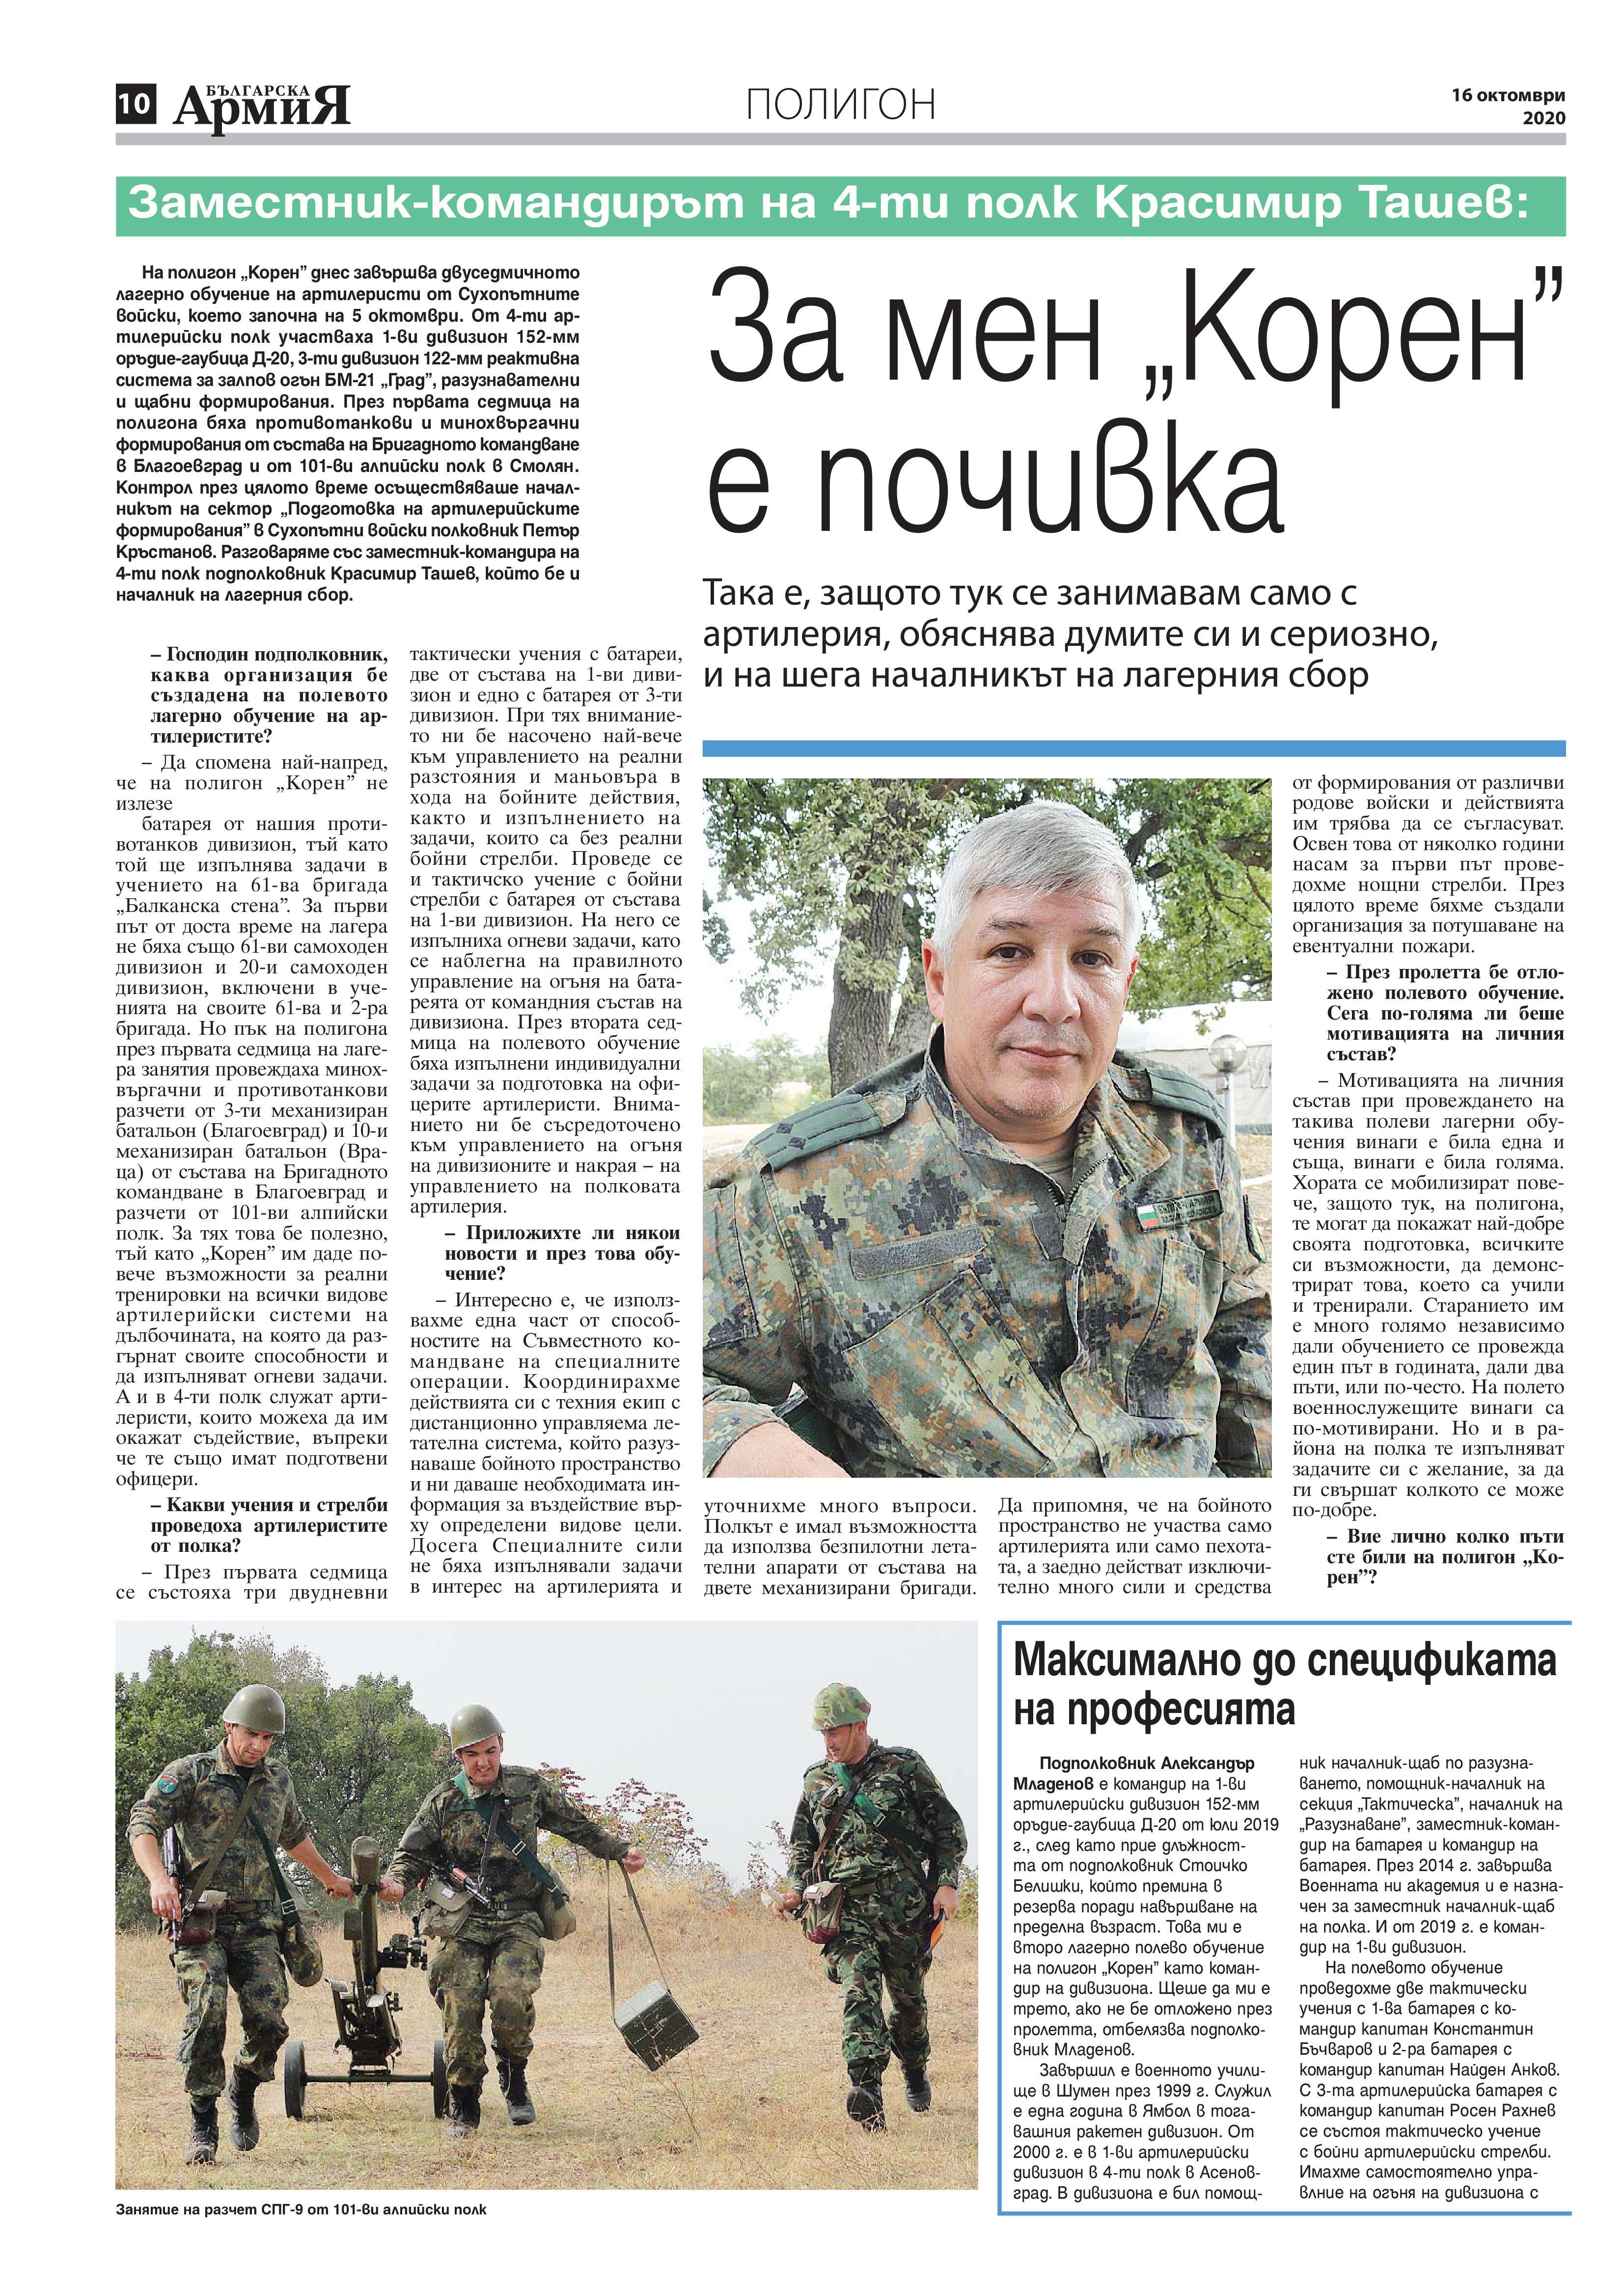 https://www.armymedia.bg/wp-content/uploads/2015/06/10-44.jpg